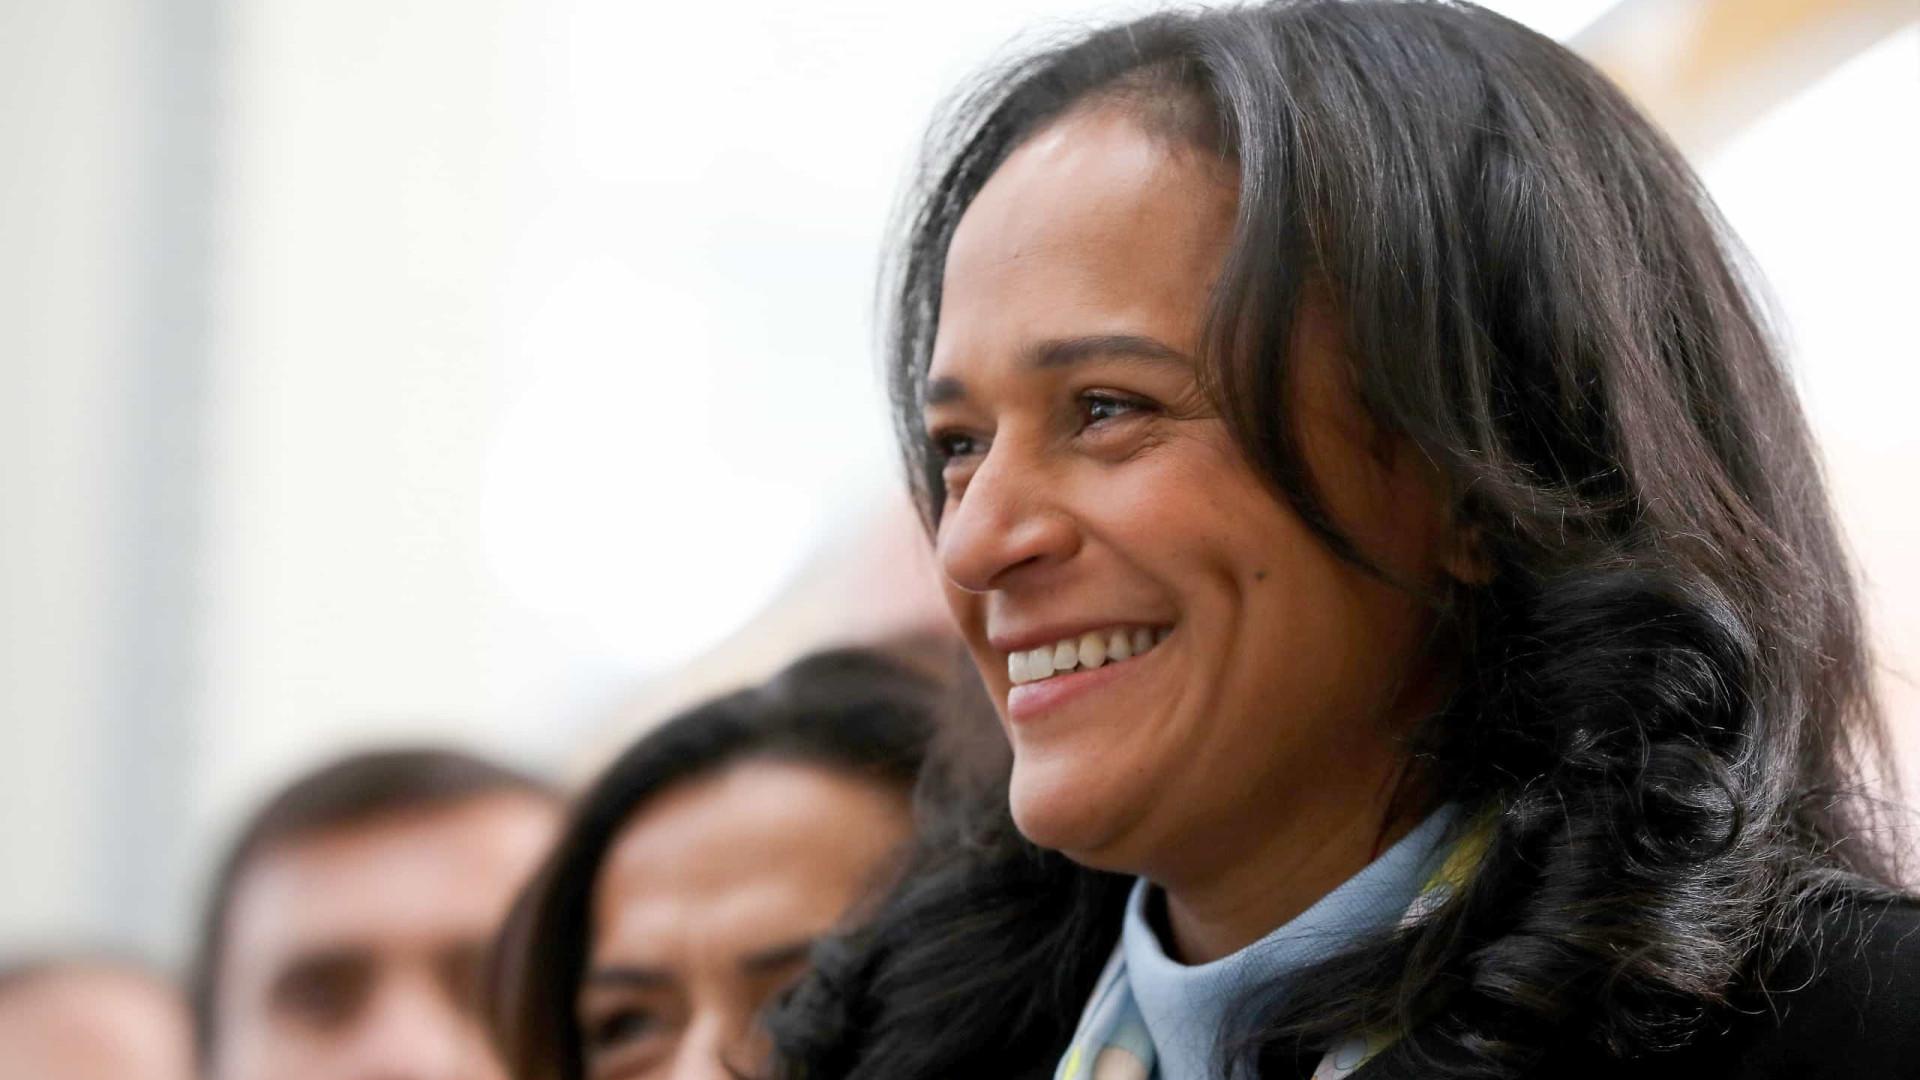 KPMG escolhida para verificar contas de Isabel dos Santos na Sonangol